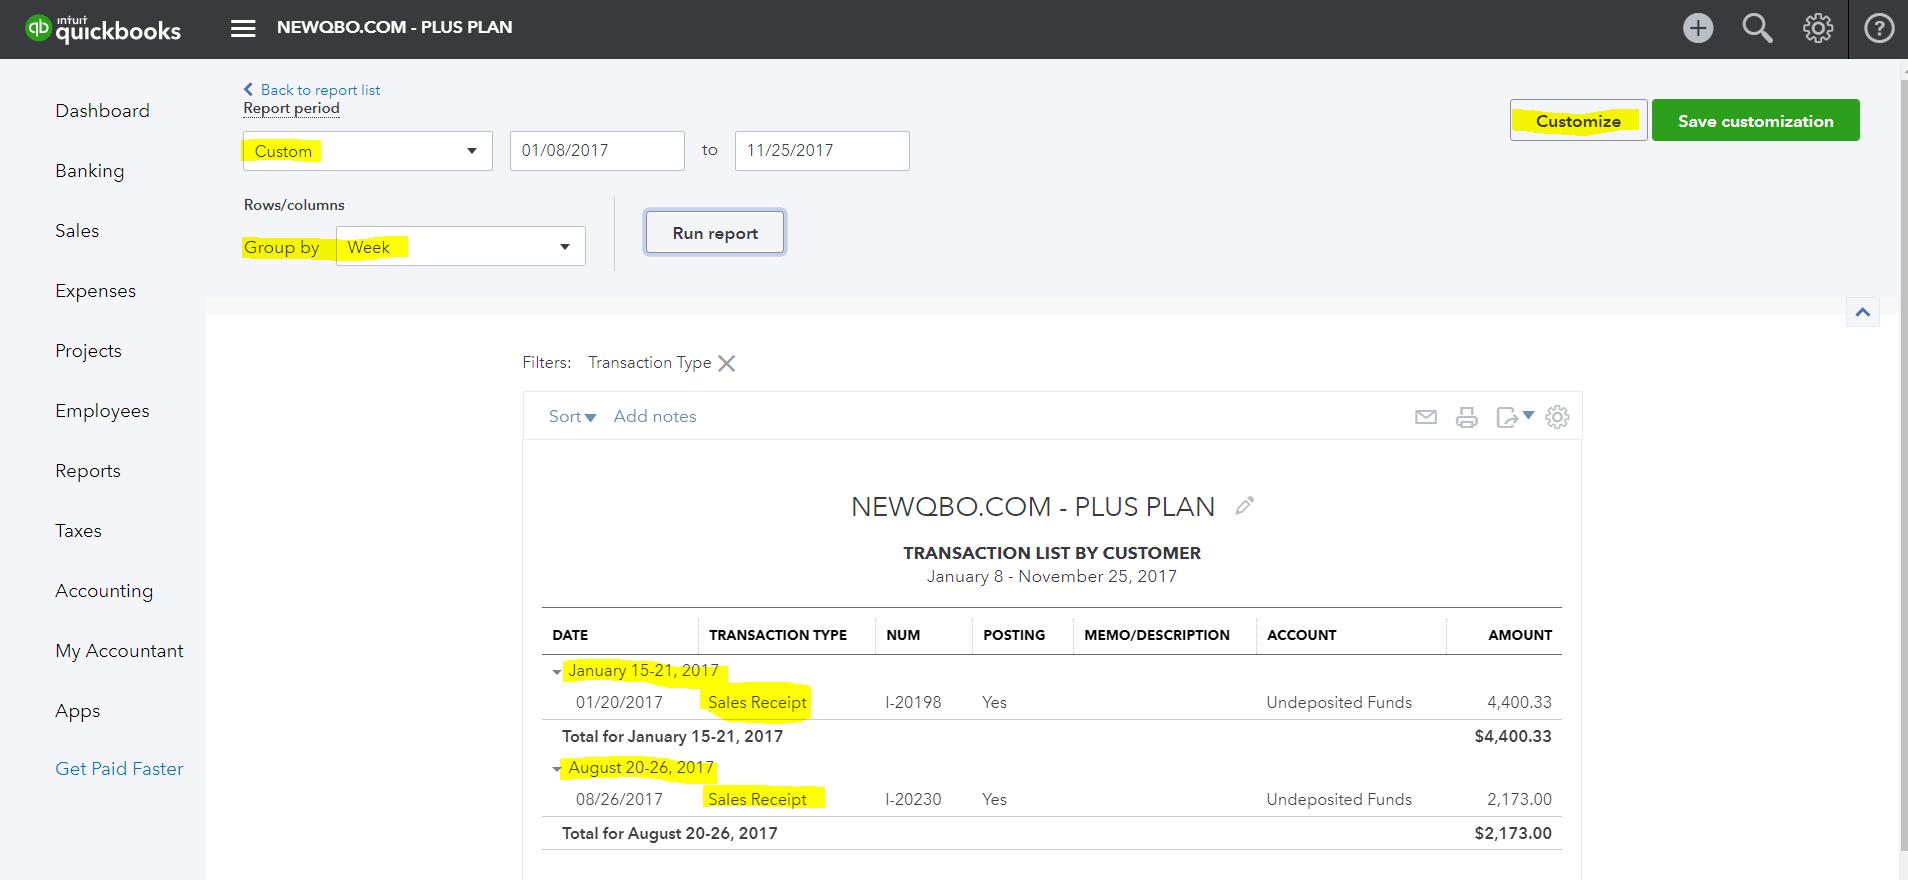 Sales Receipt NEWQBOCOM - Making receipts for customers